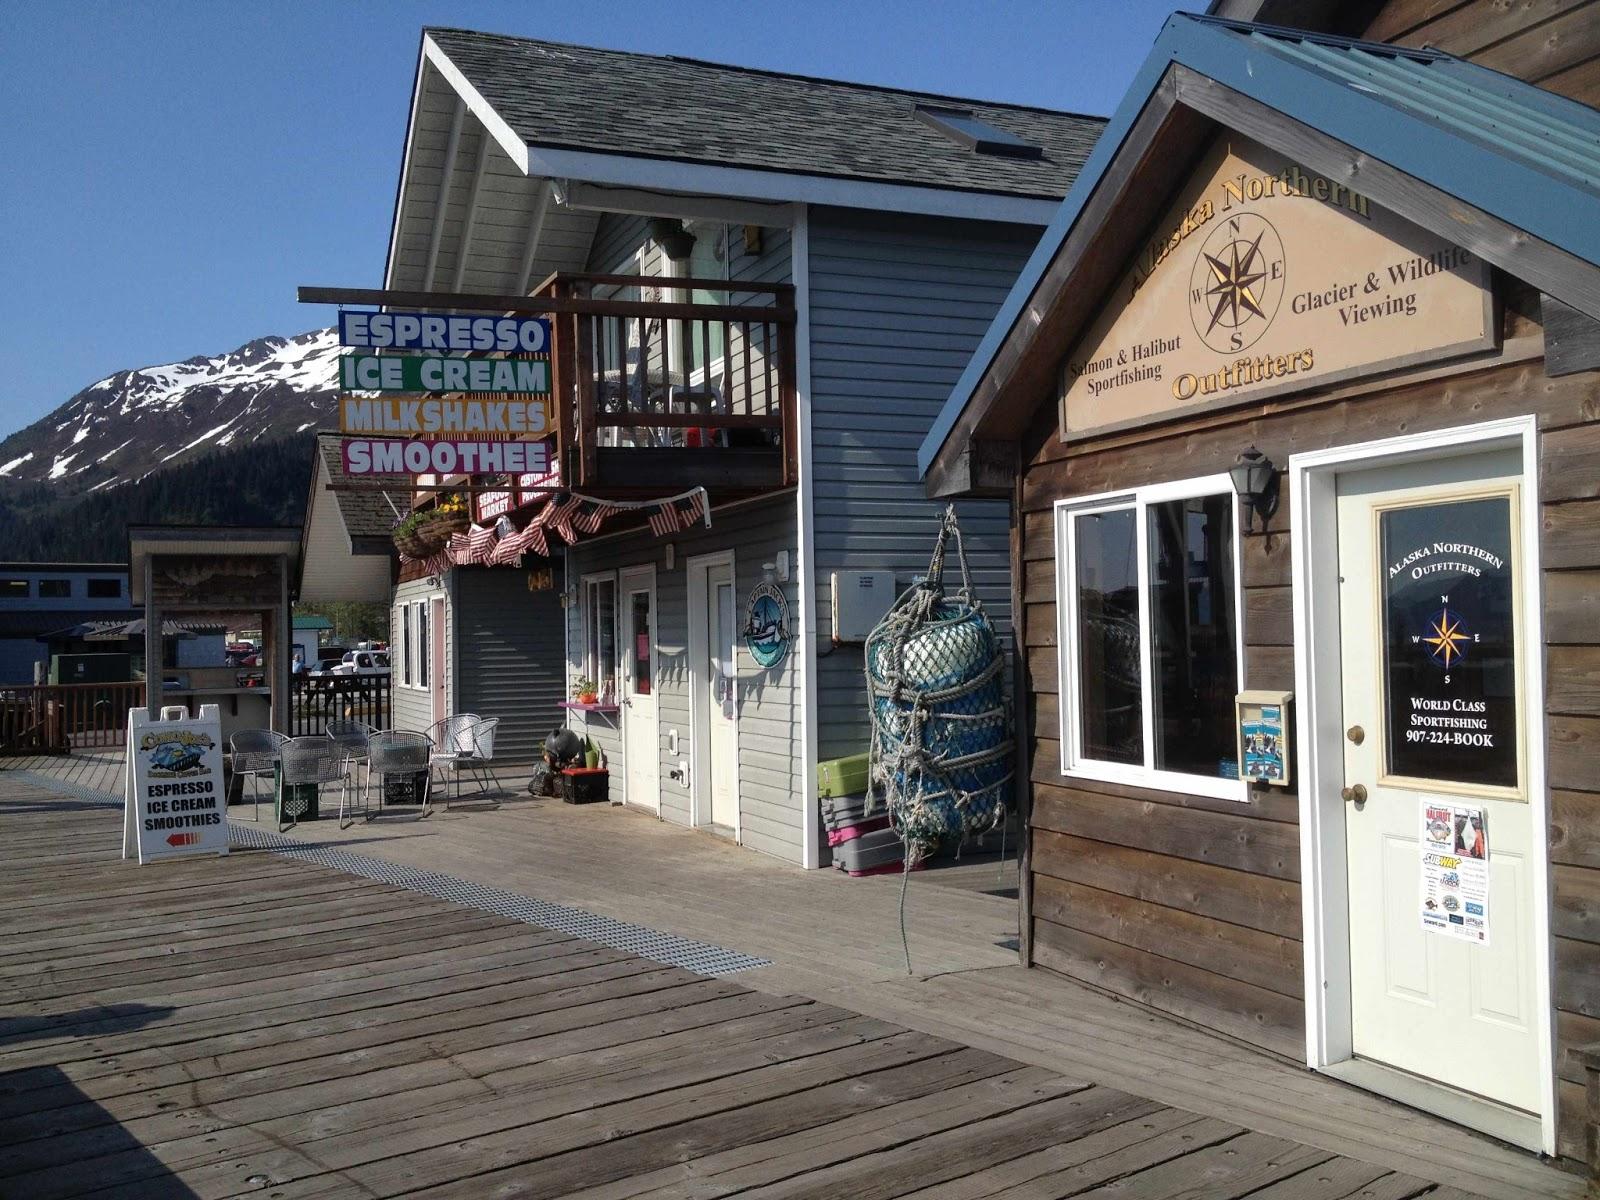 Small Boat Harbor Seward Alaska on Seward Glacier Boat Tours